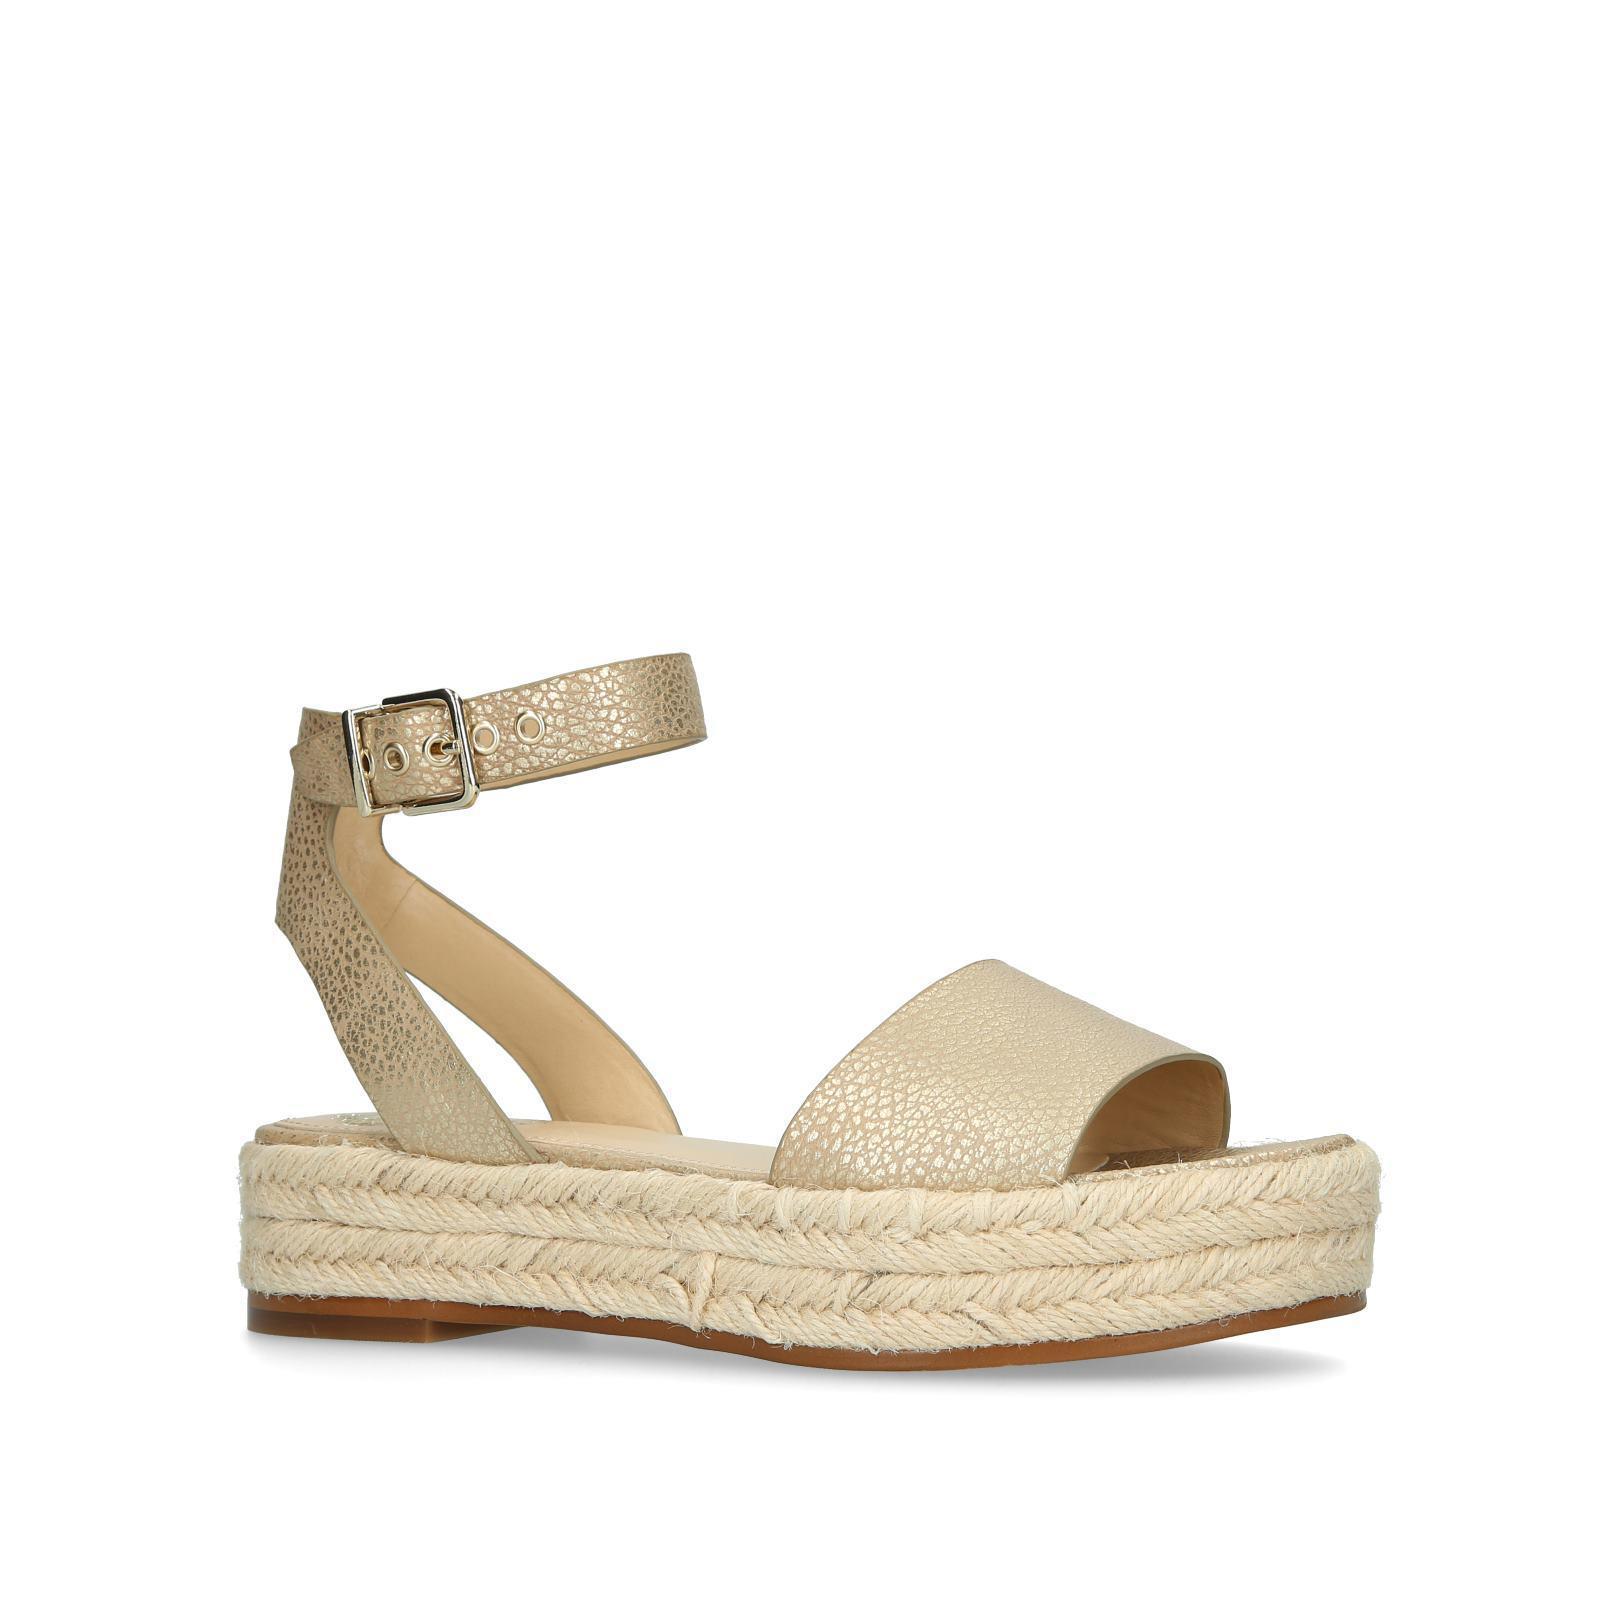 low shipping fee sale online cheap sale 100% original Gold 'Kathalia' flatform sandals sale big sale cheap sale countdown package 4dqDm